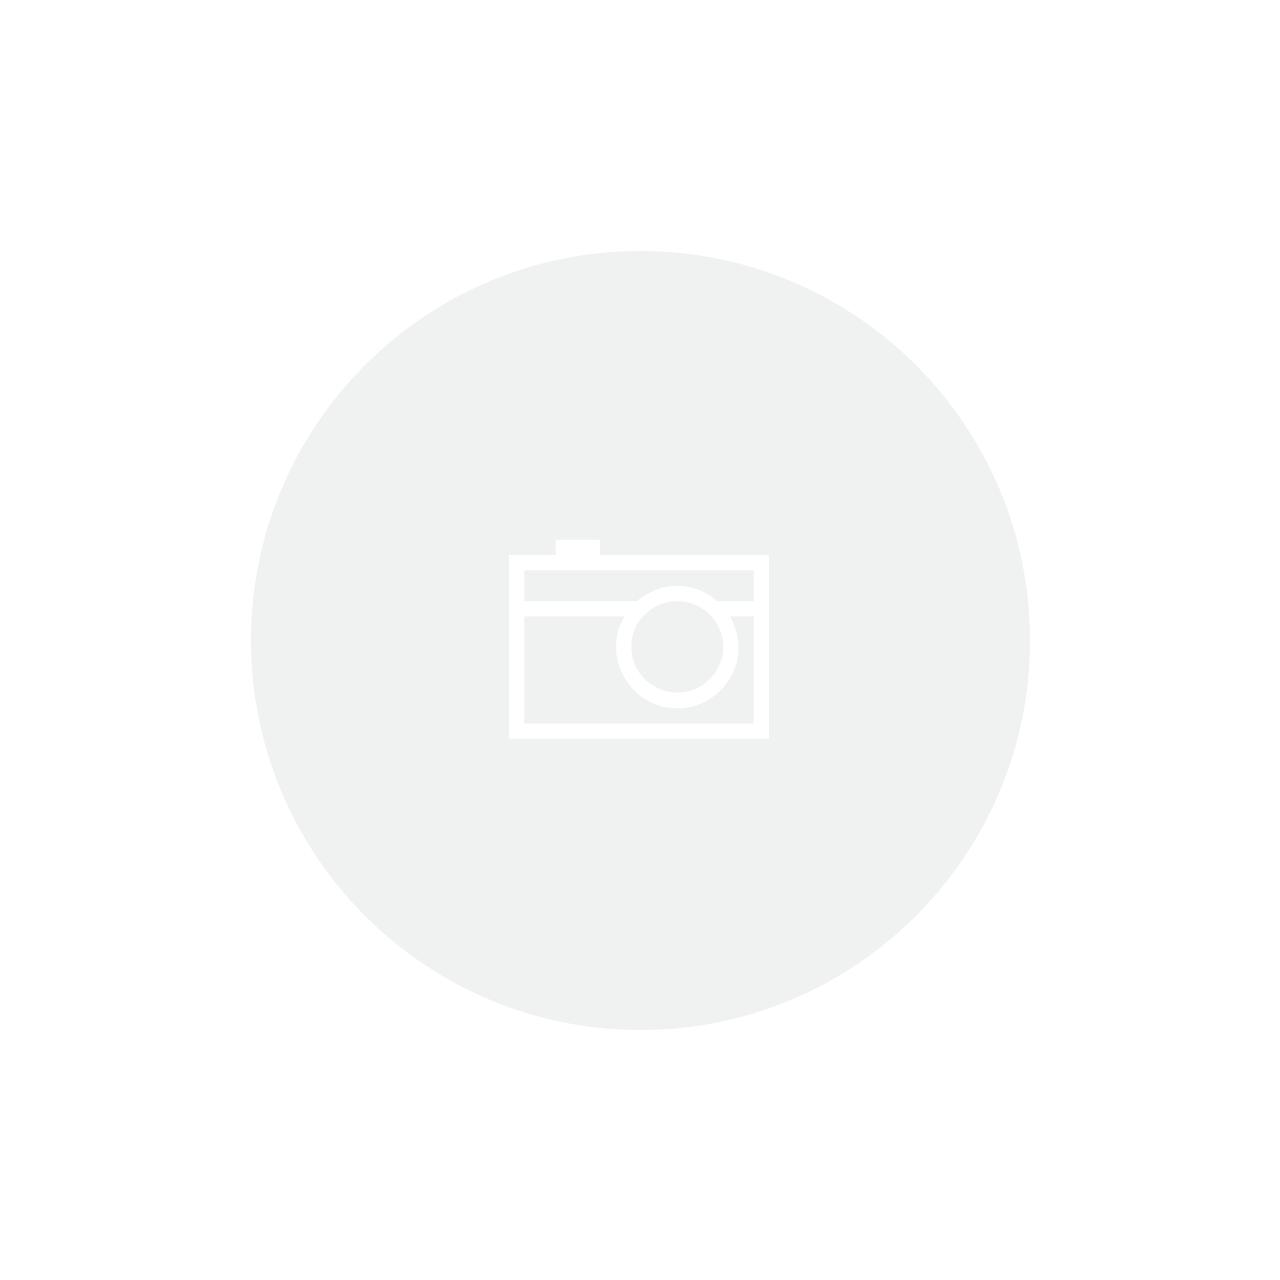 GPS GARMIN EDGE 1030 BUNDLE C/ MONITOR E CINTA CARDIACA